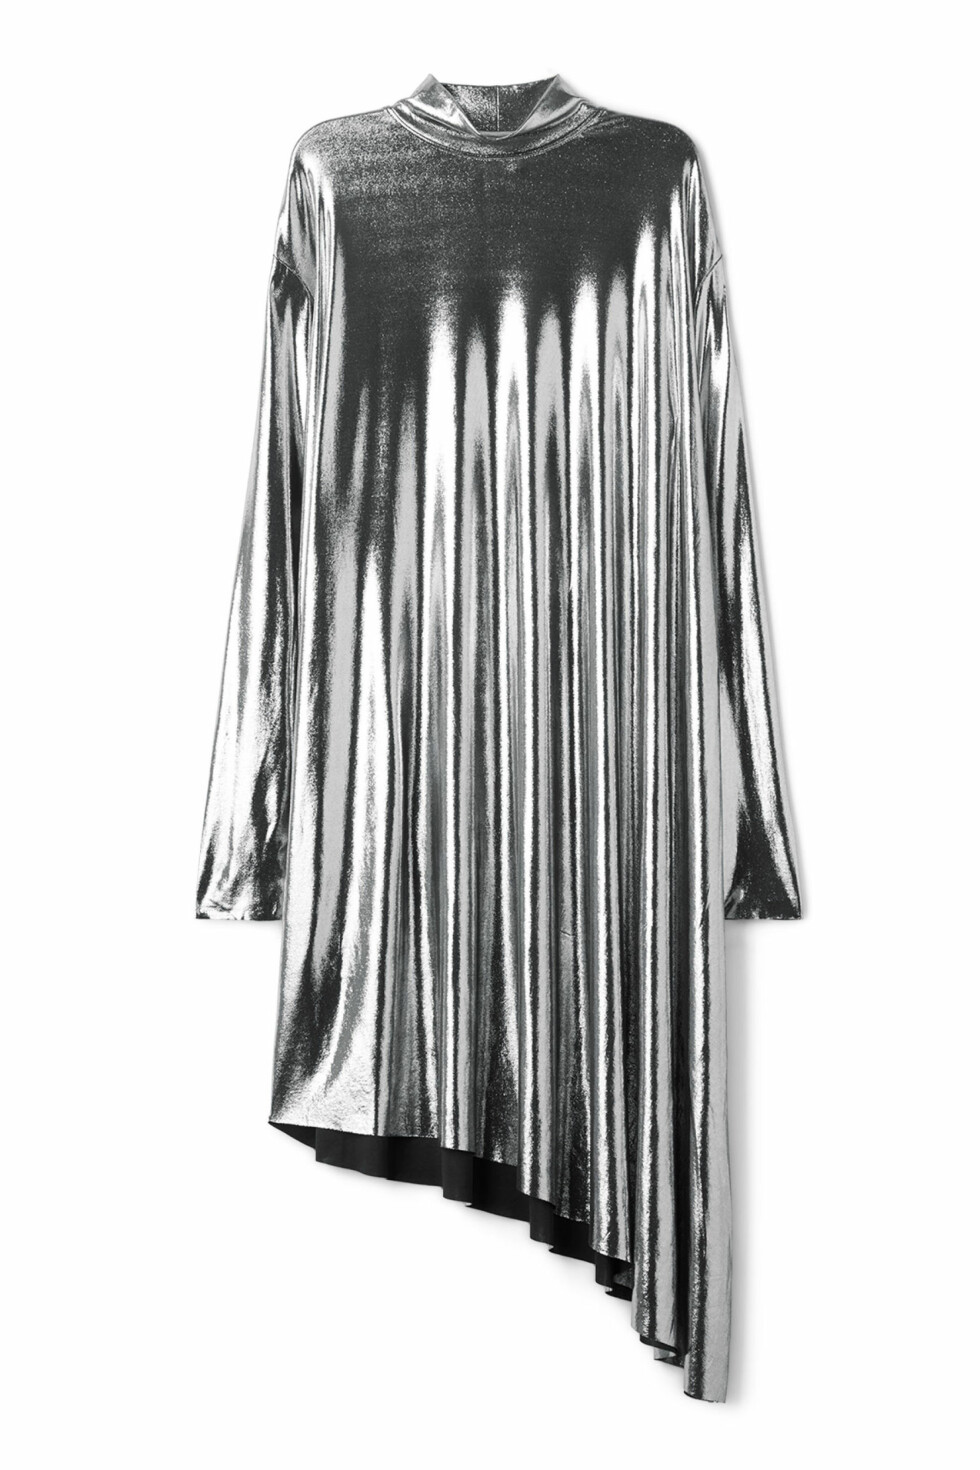 Kjole fra Weekday |400,-| https://www.weekday.com/en_sek/women/categories/dresses-and-jumpsuits/product.allison-dress-silver.0568959002.html